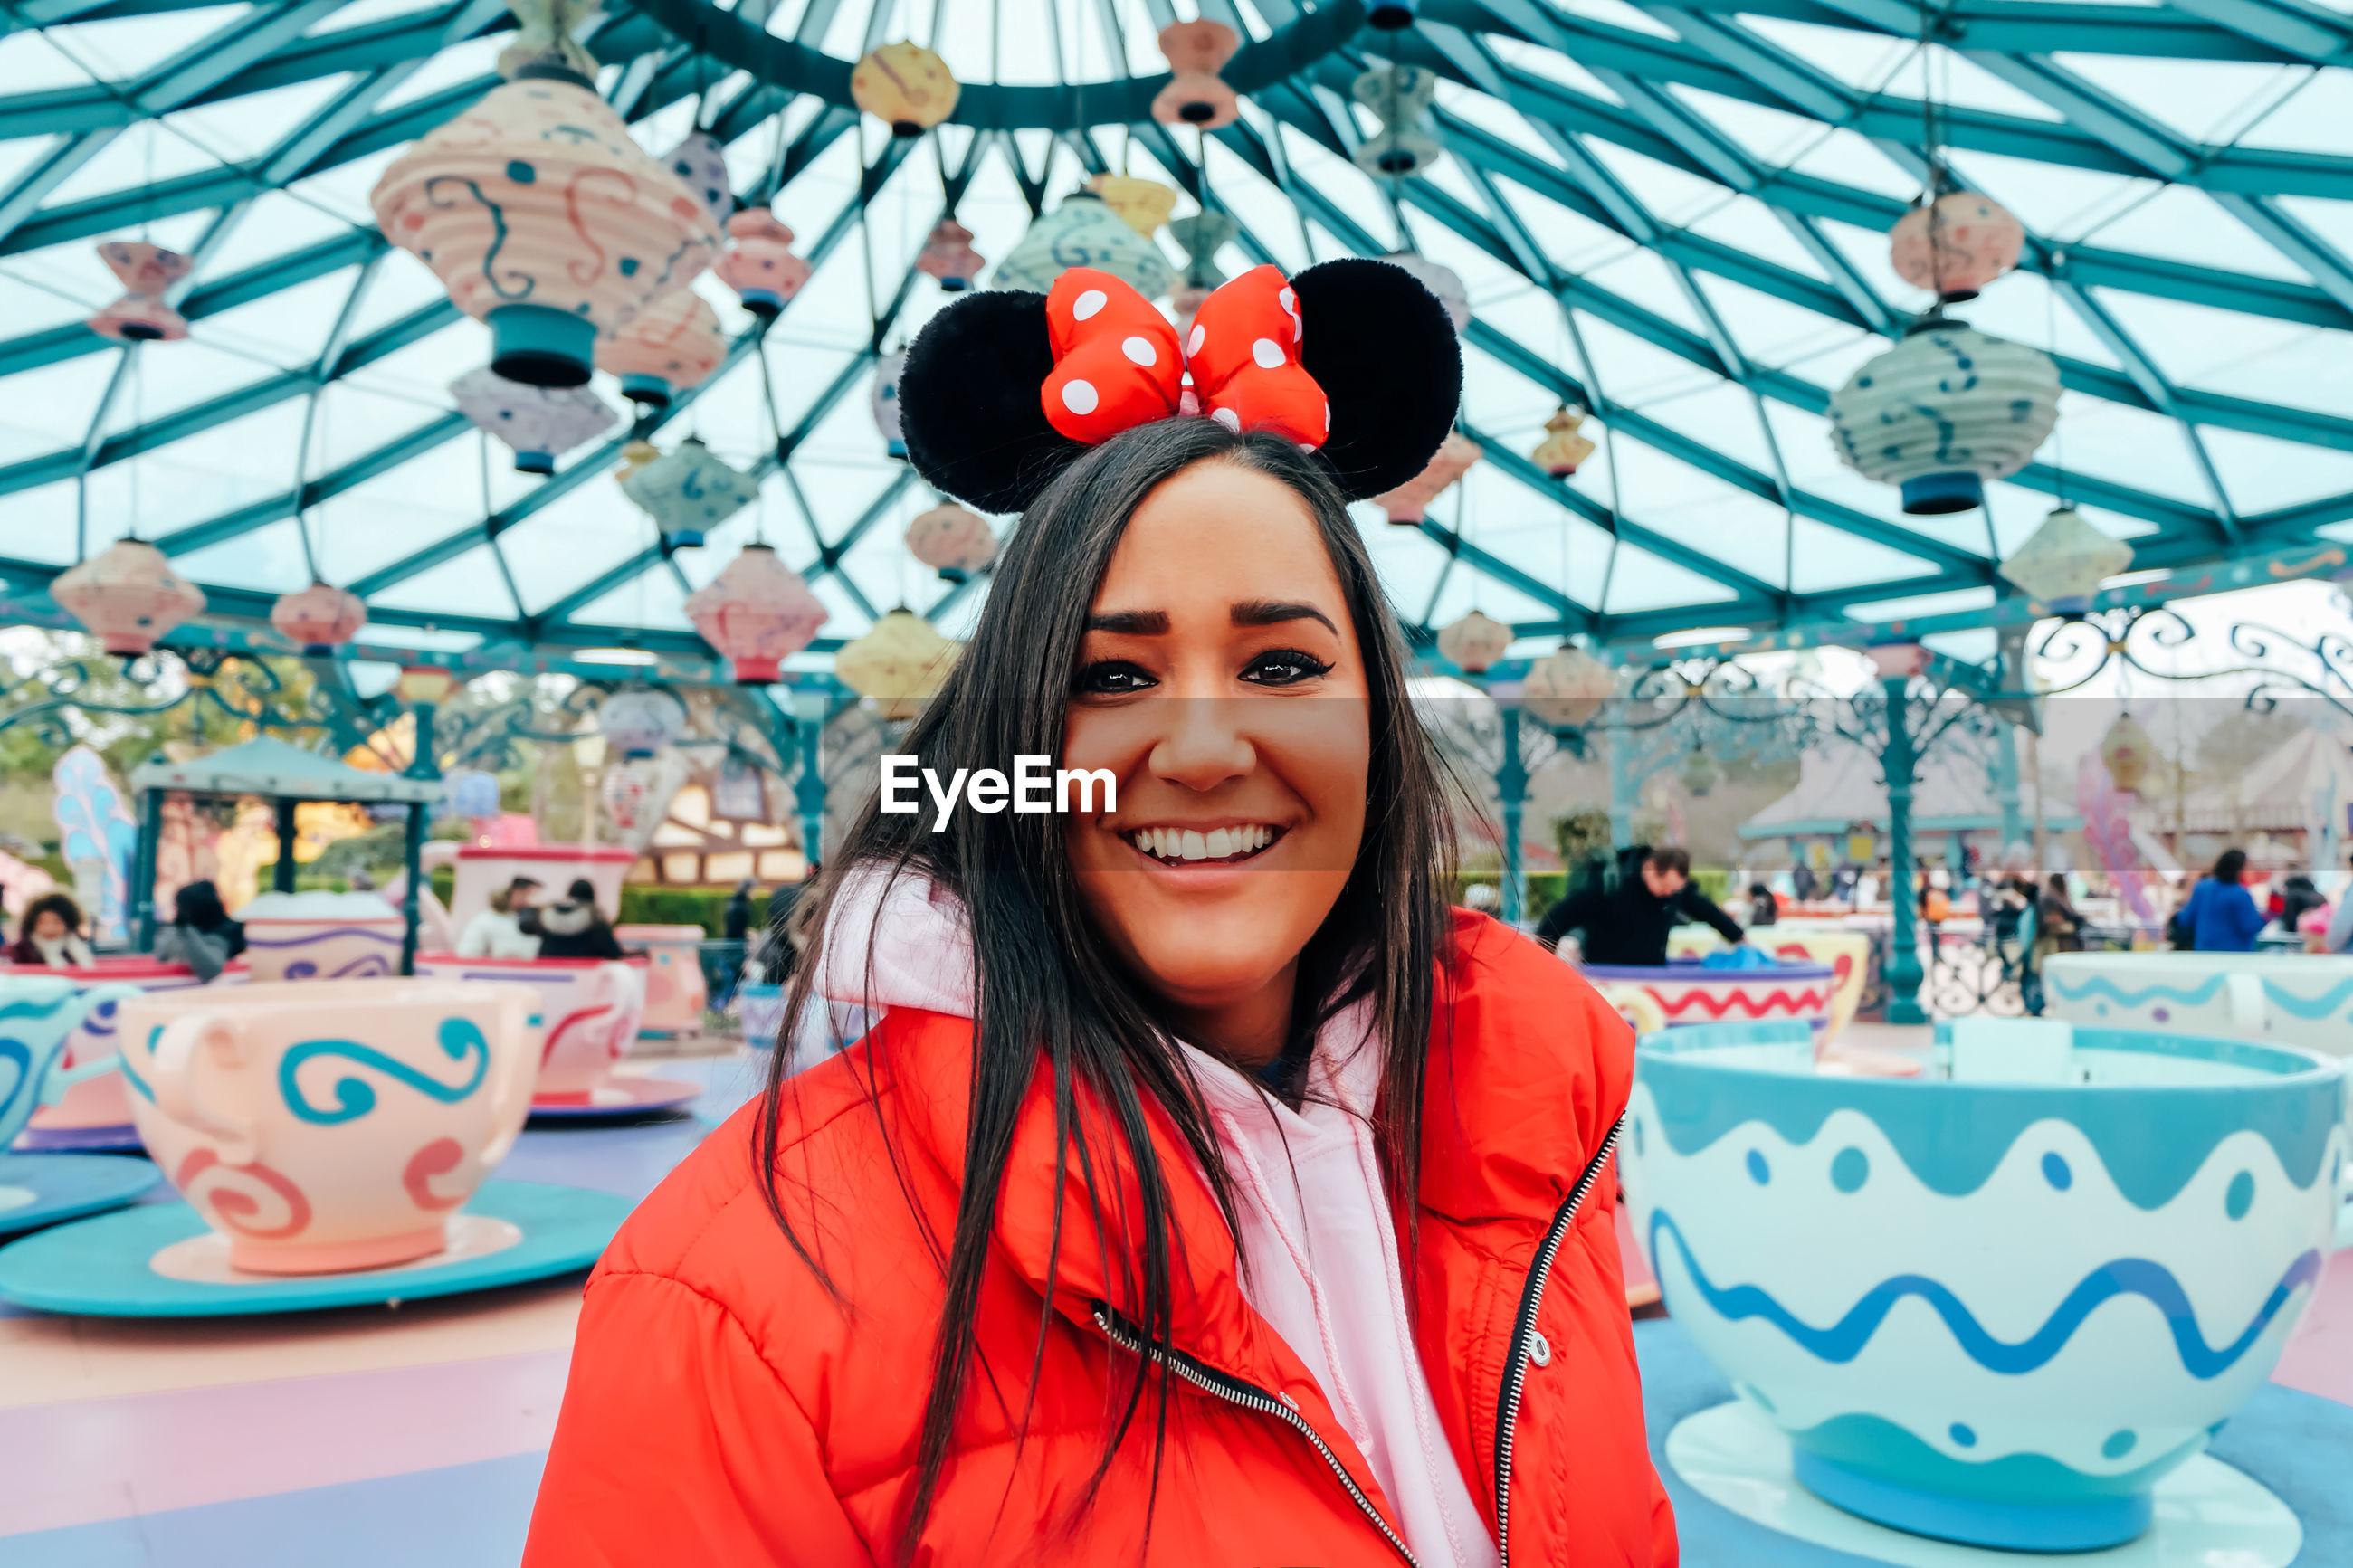 Portrait of smiling young woman at amusement park